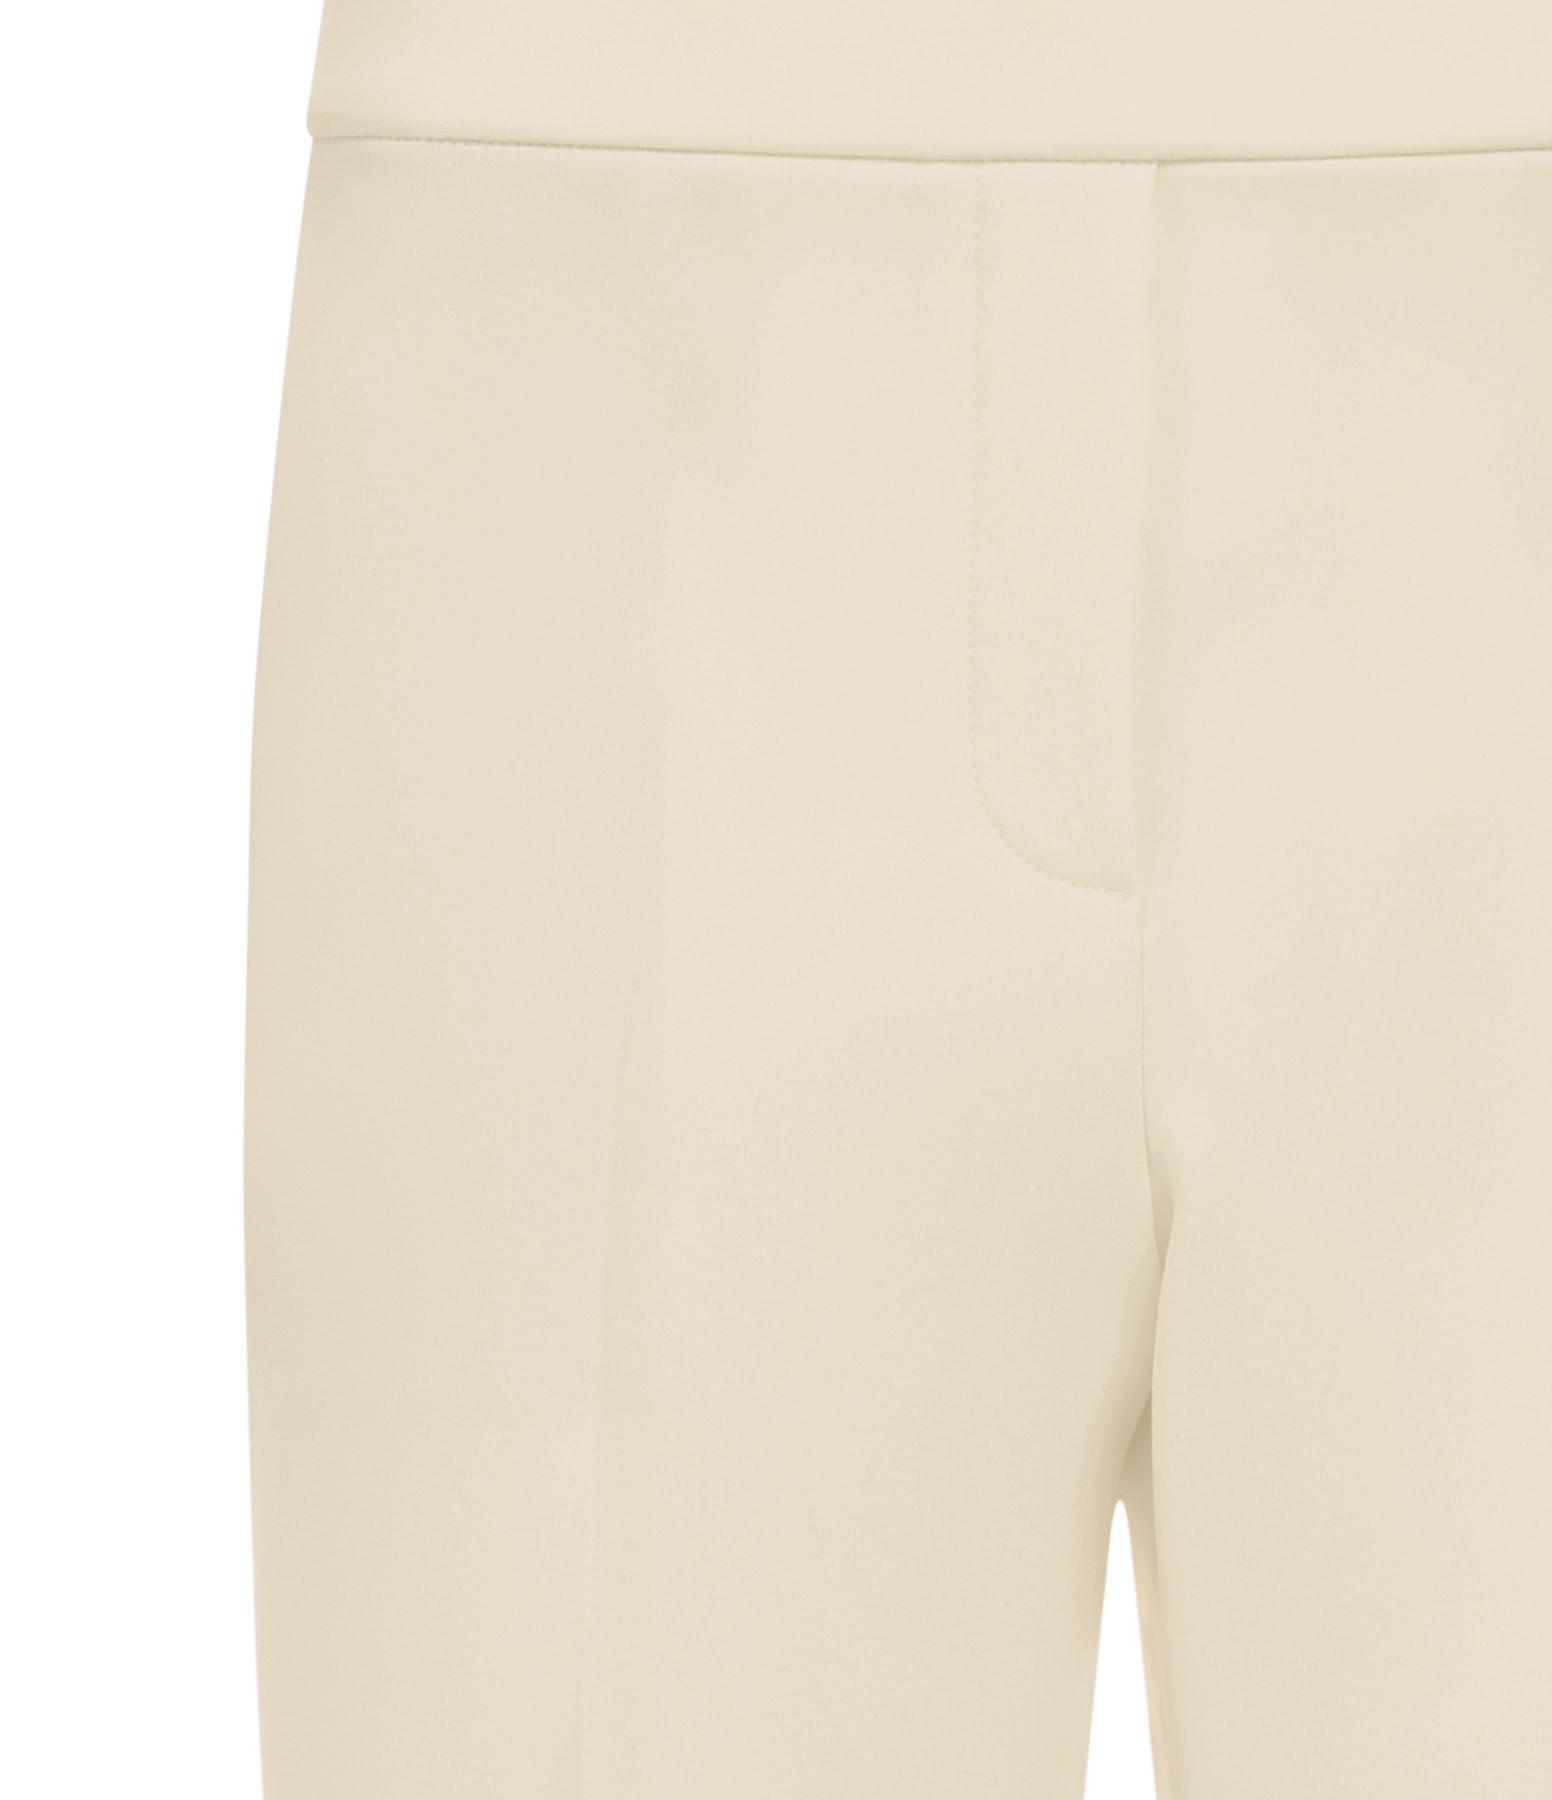 THEORY - Pantalon Treeca Beige